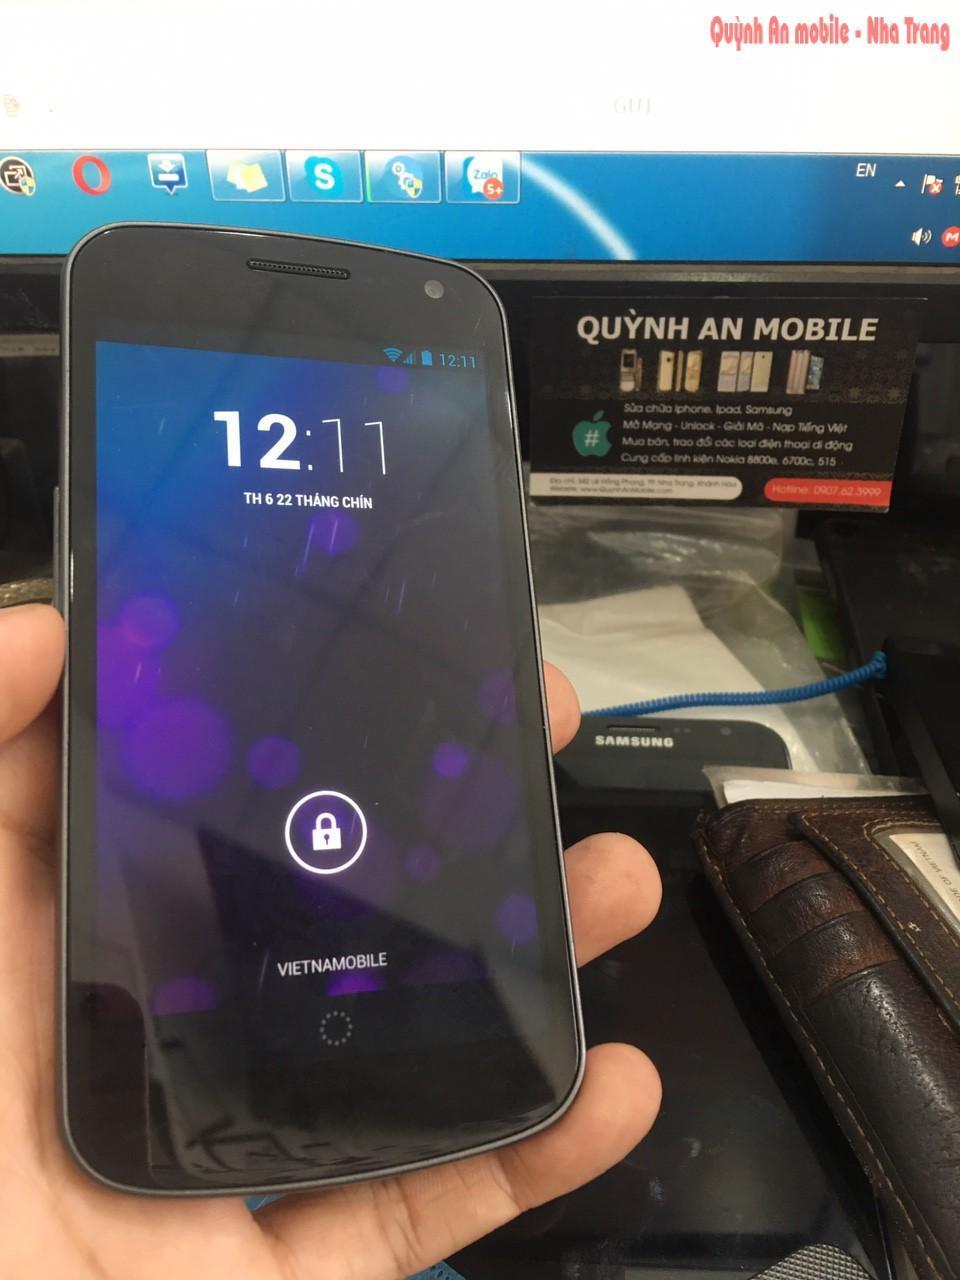 Unlock Samsung Galaxy nexus SC-04D tại Nha Trang